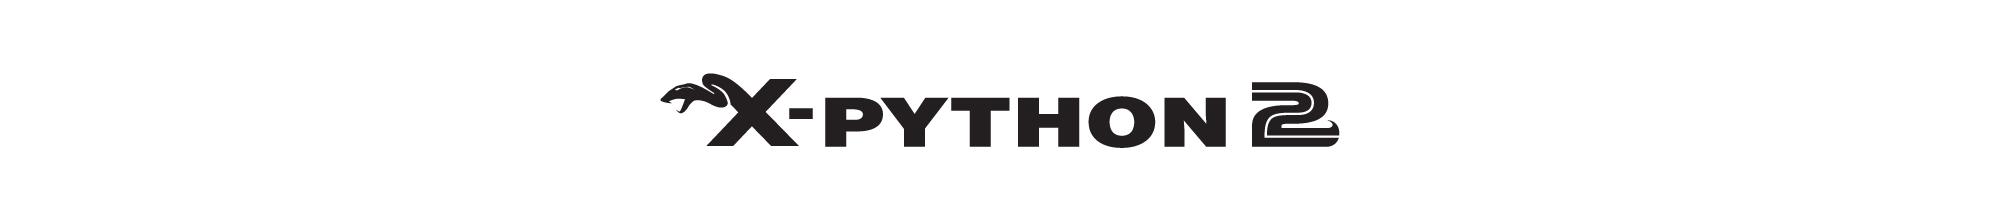 X-PYTHON 2-swimwear